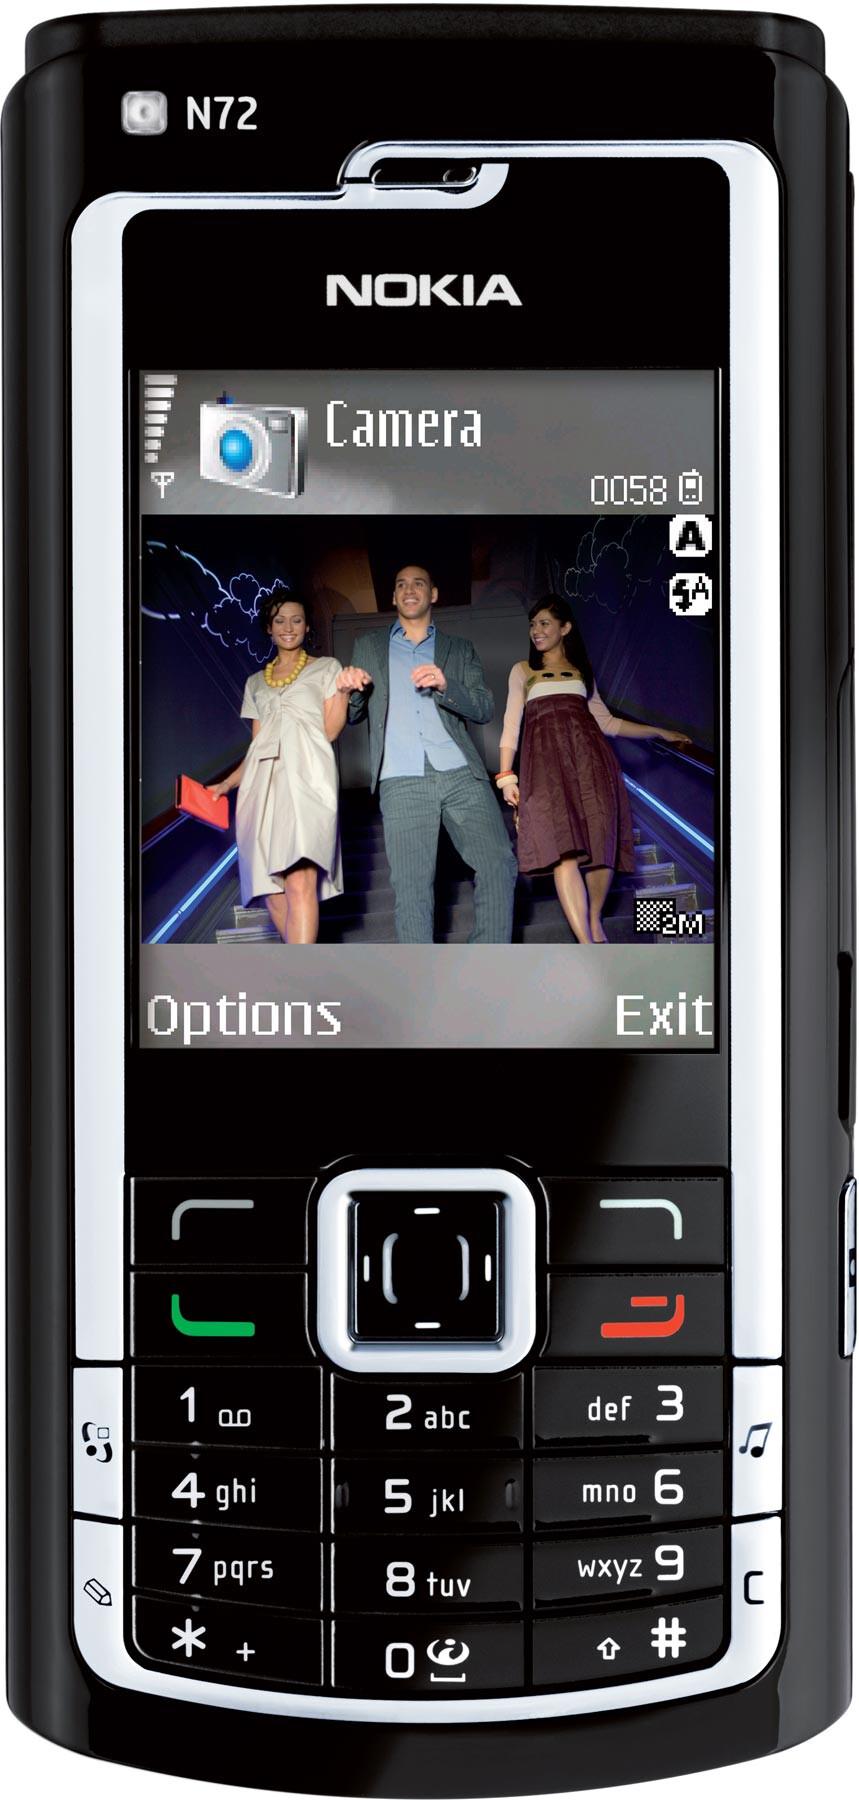 Nokia 7610 / 7610B vs Nokia N72 - Visual phone size compare